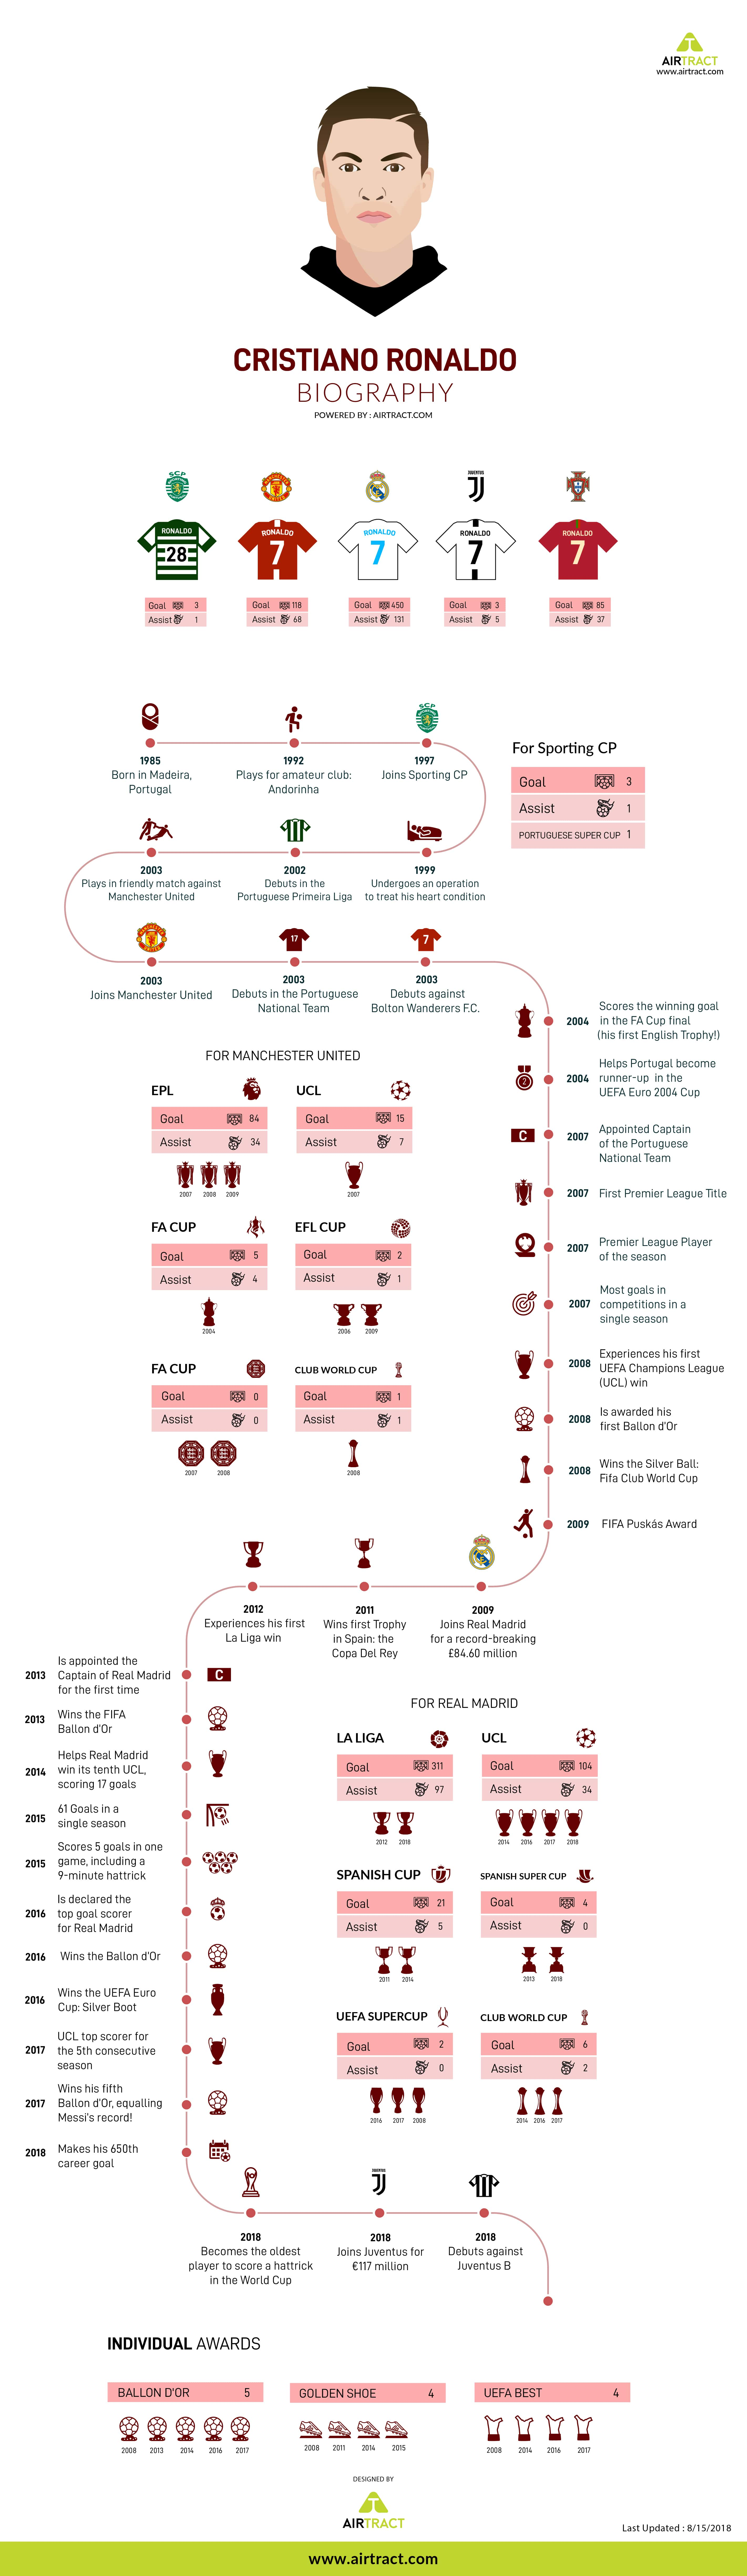 cristiano-ronaldo-bigraphy-timeline-infographic-plaza